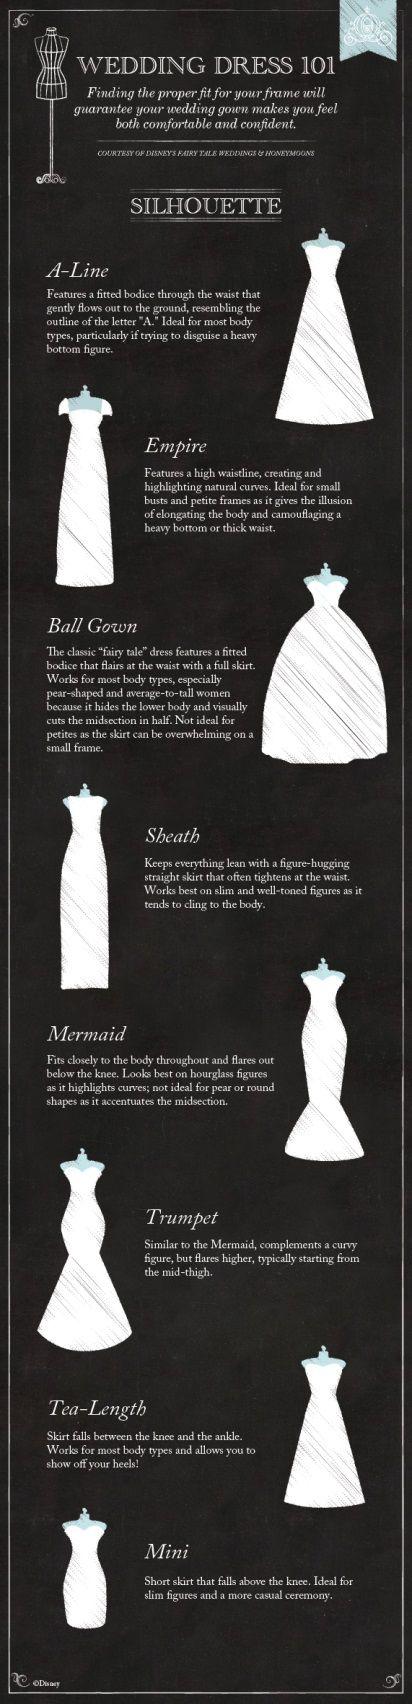 Wedding Dress 101: The Silhouette #Disney #wedding #dress